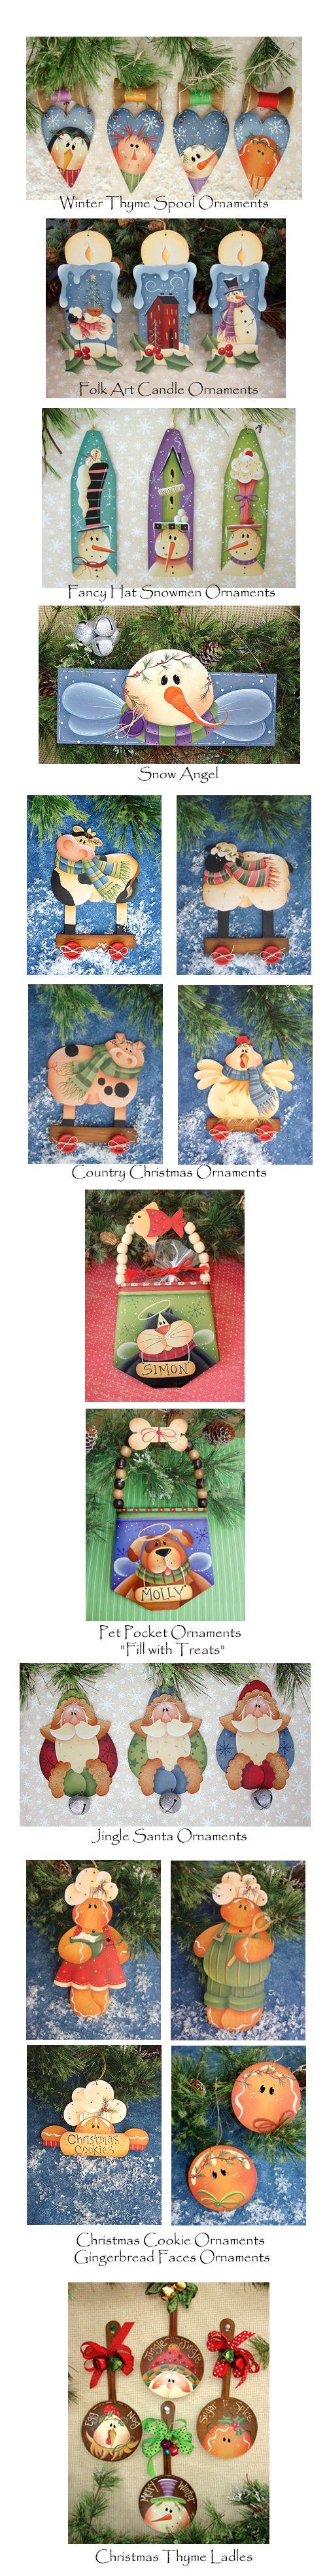 AWESOME HOLIDAY STUFF - SNOWMEN, ETC.  http://pinterest.com/slucy/3-holiday-season-love-patterns-ideas/